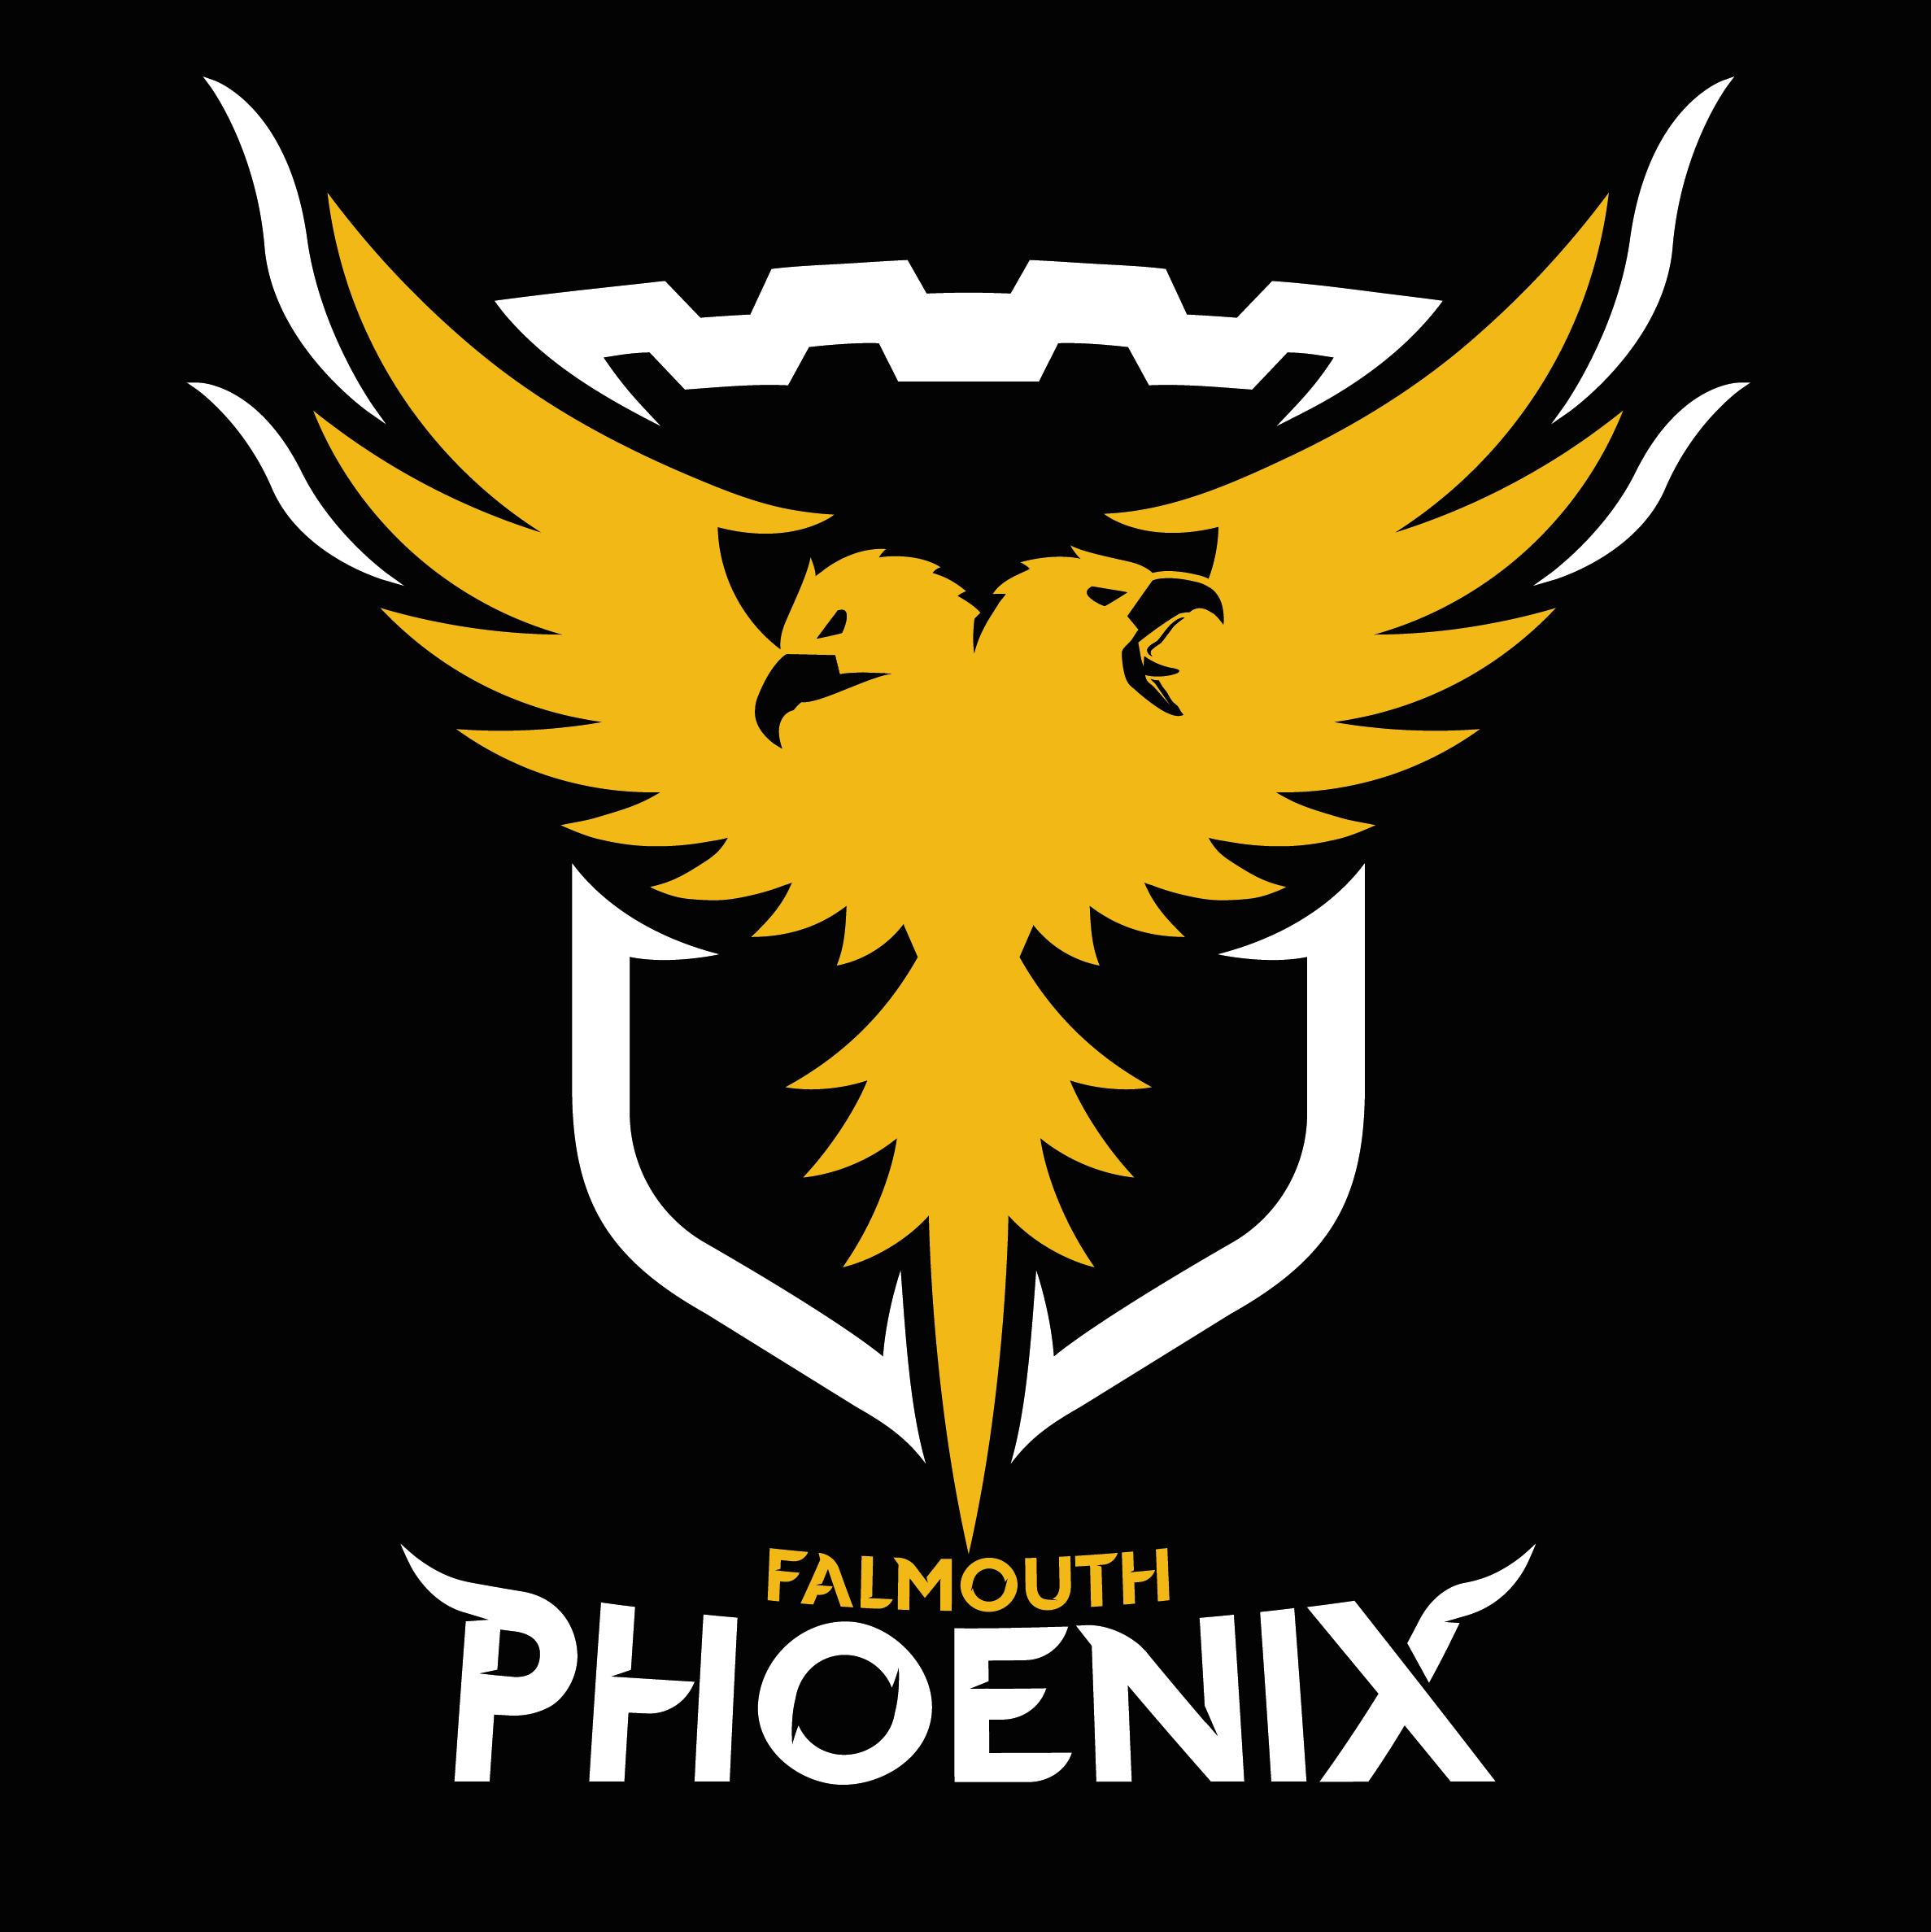 Falmouth Phoenix